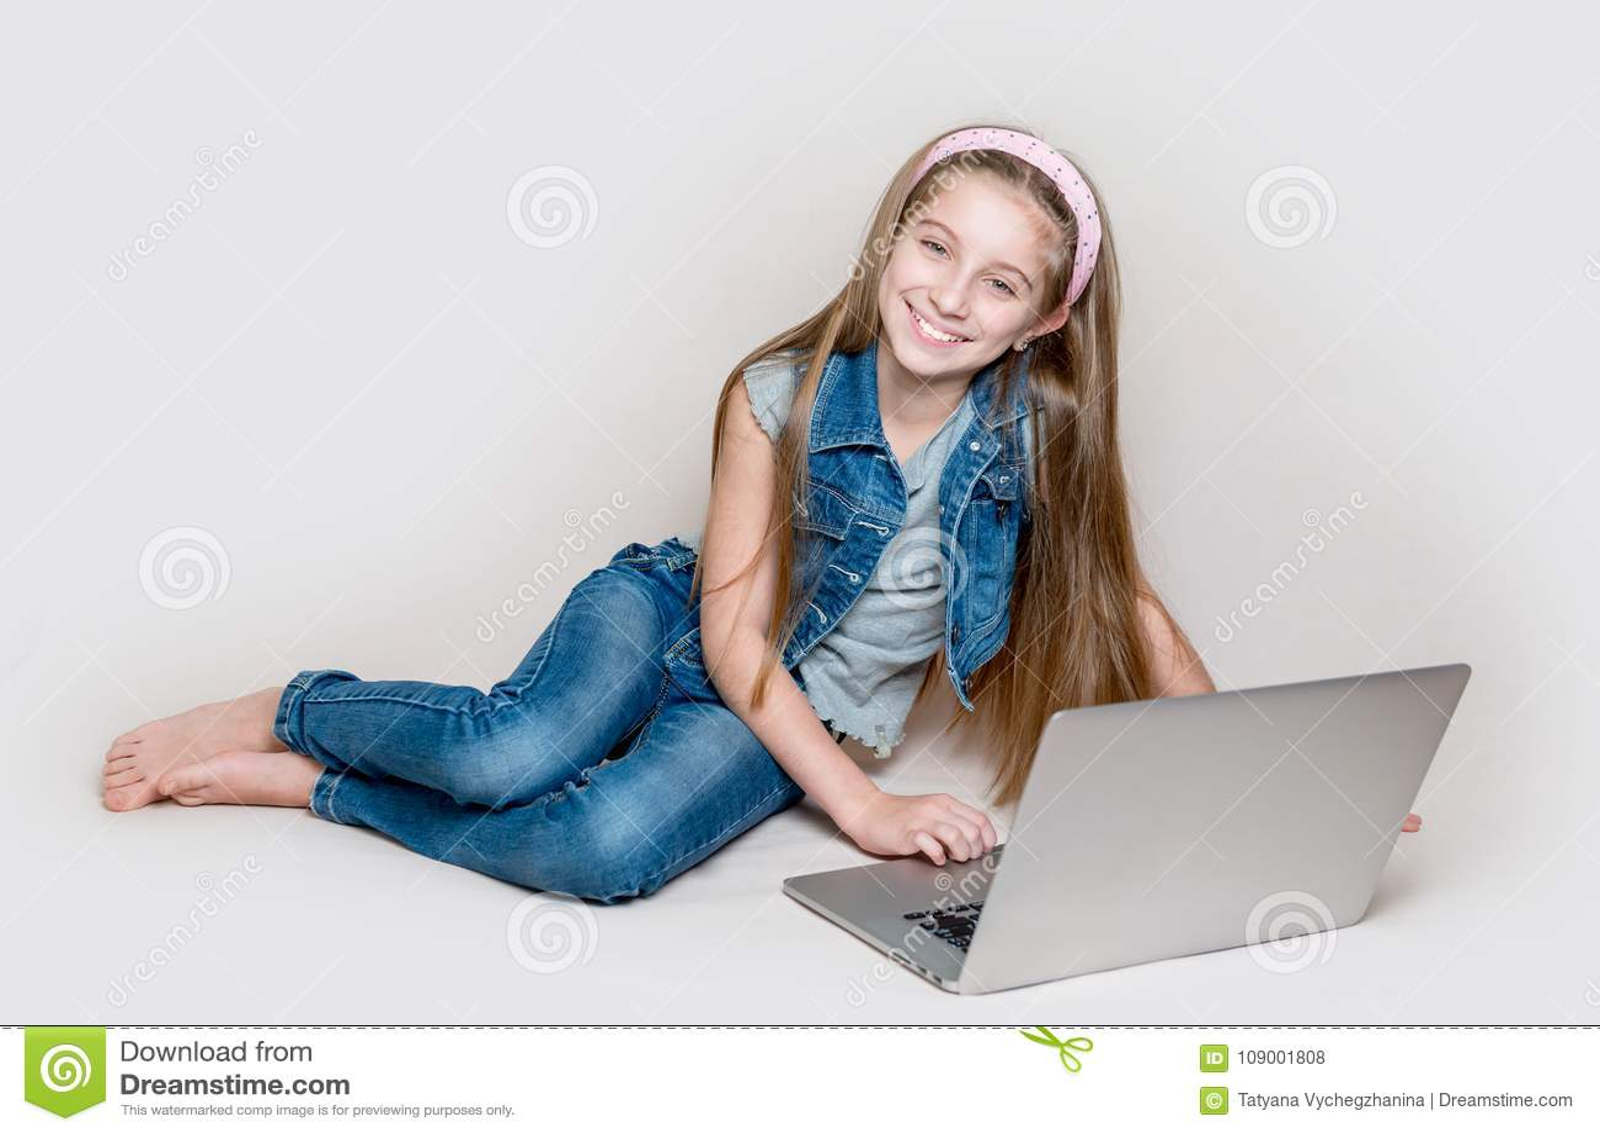 Litllemeisje die op vloer met laptop liggen